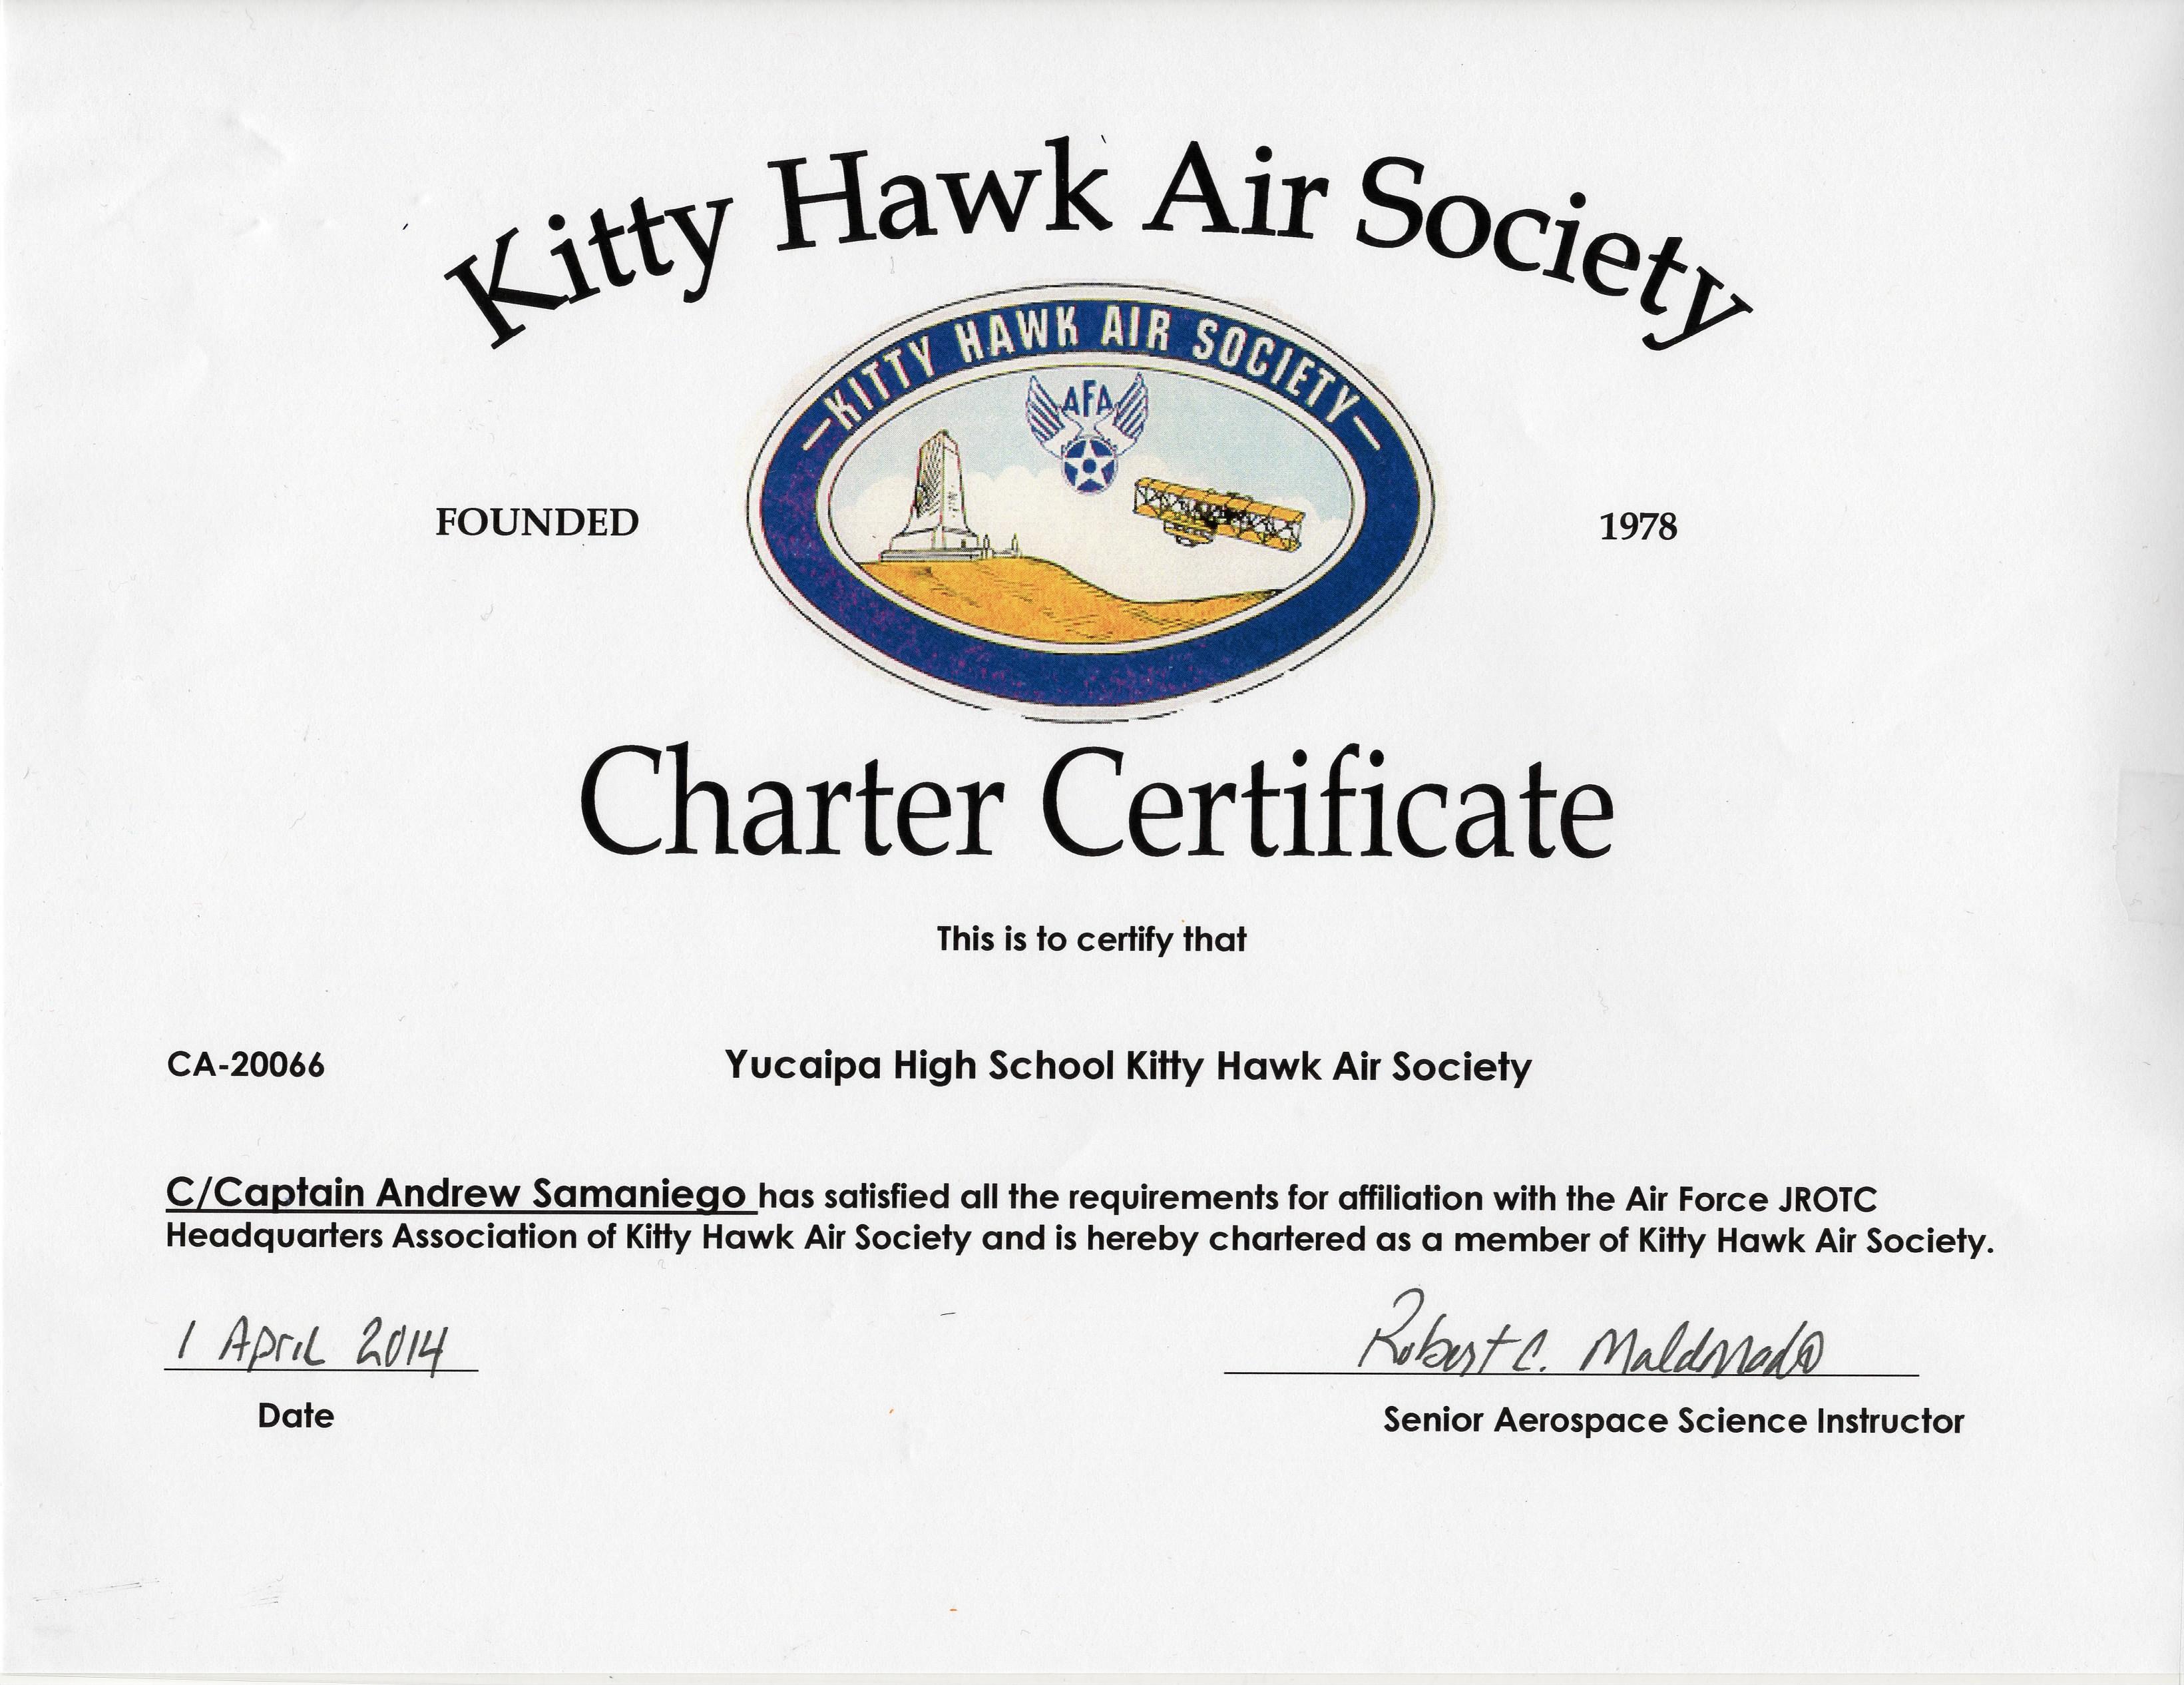 Kitty Hawk Air Society